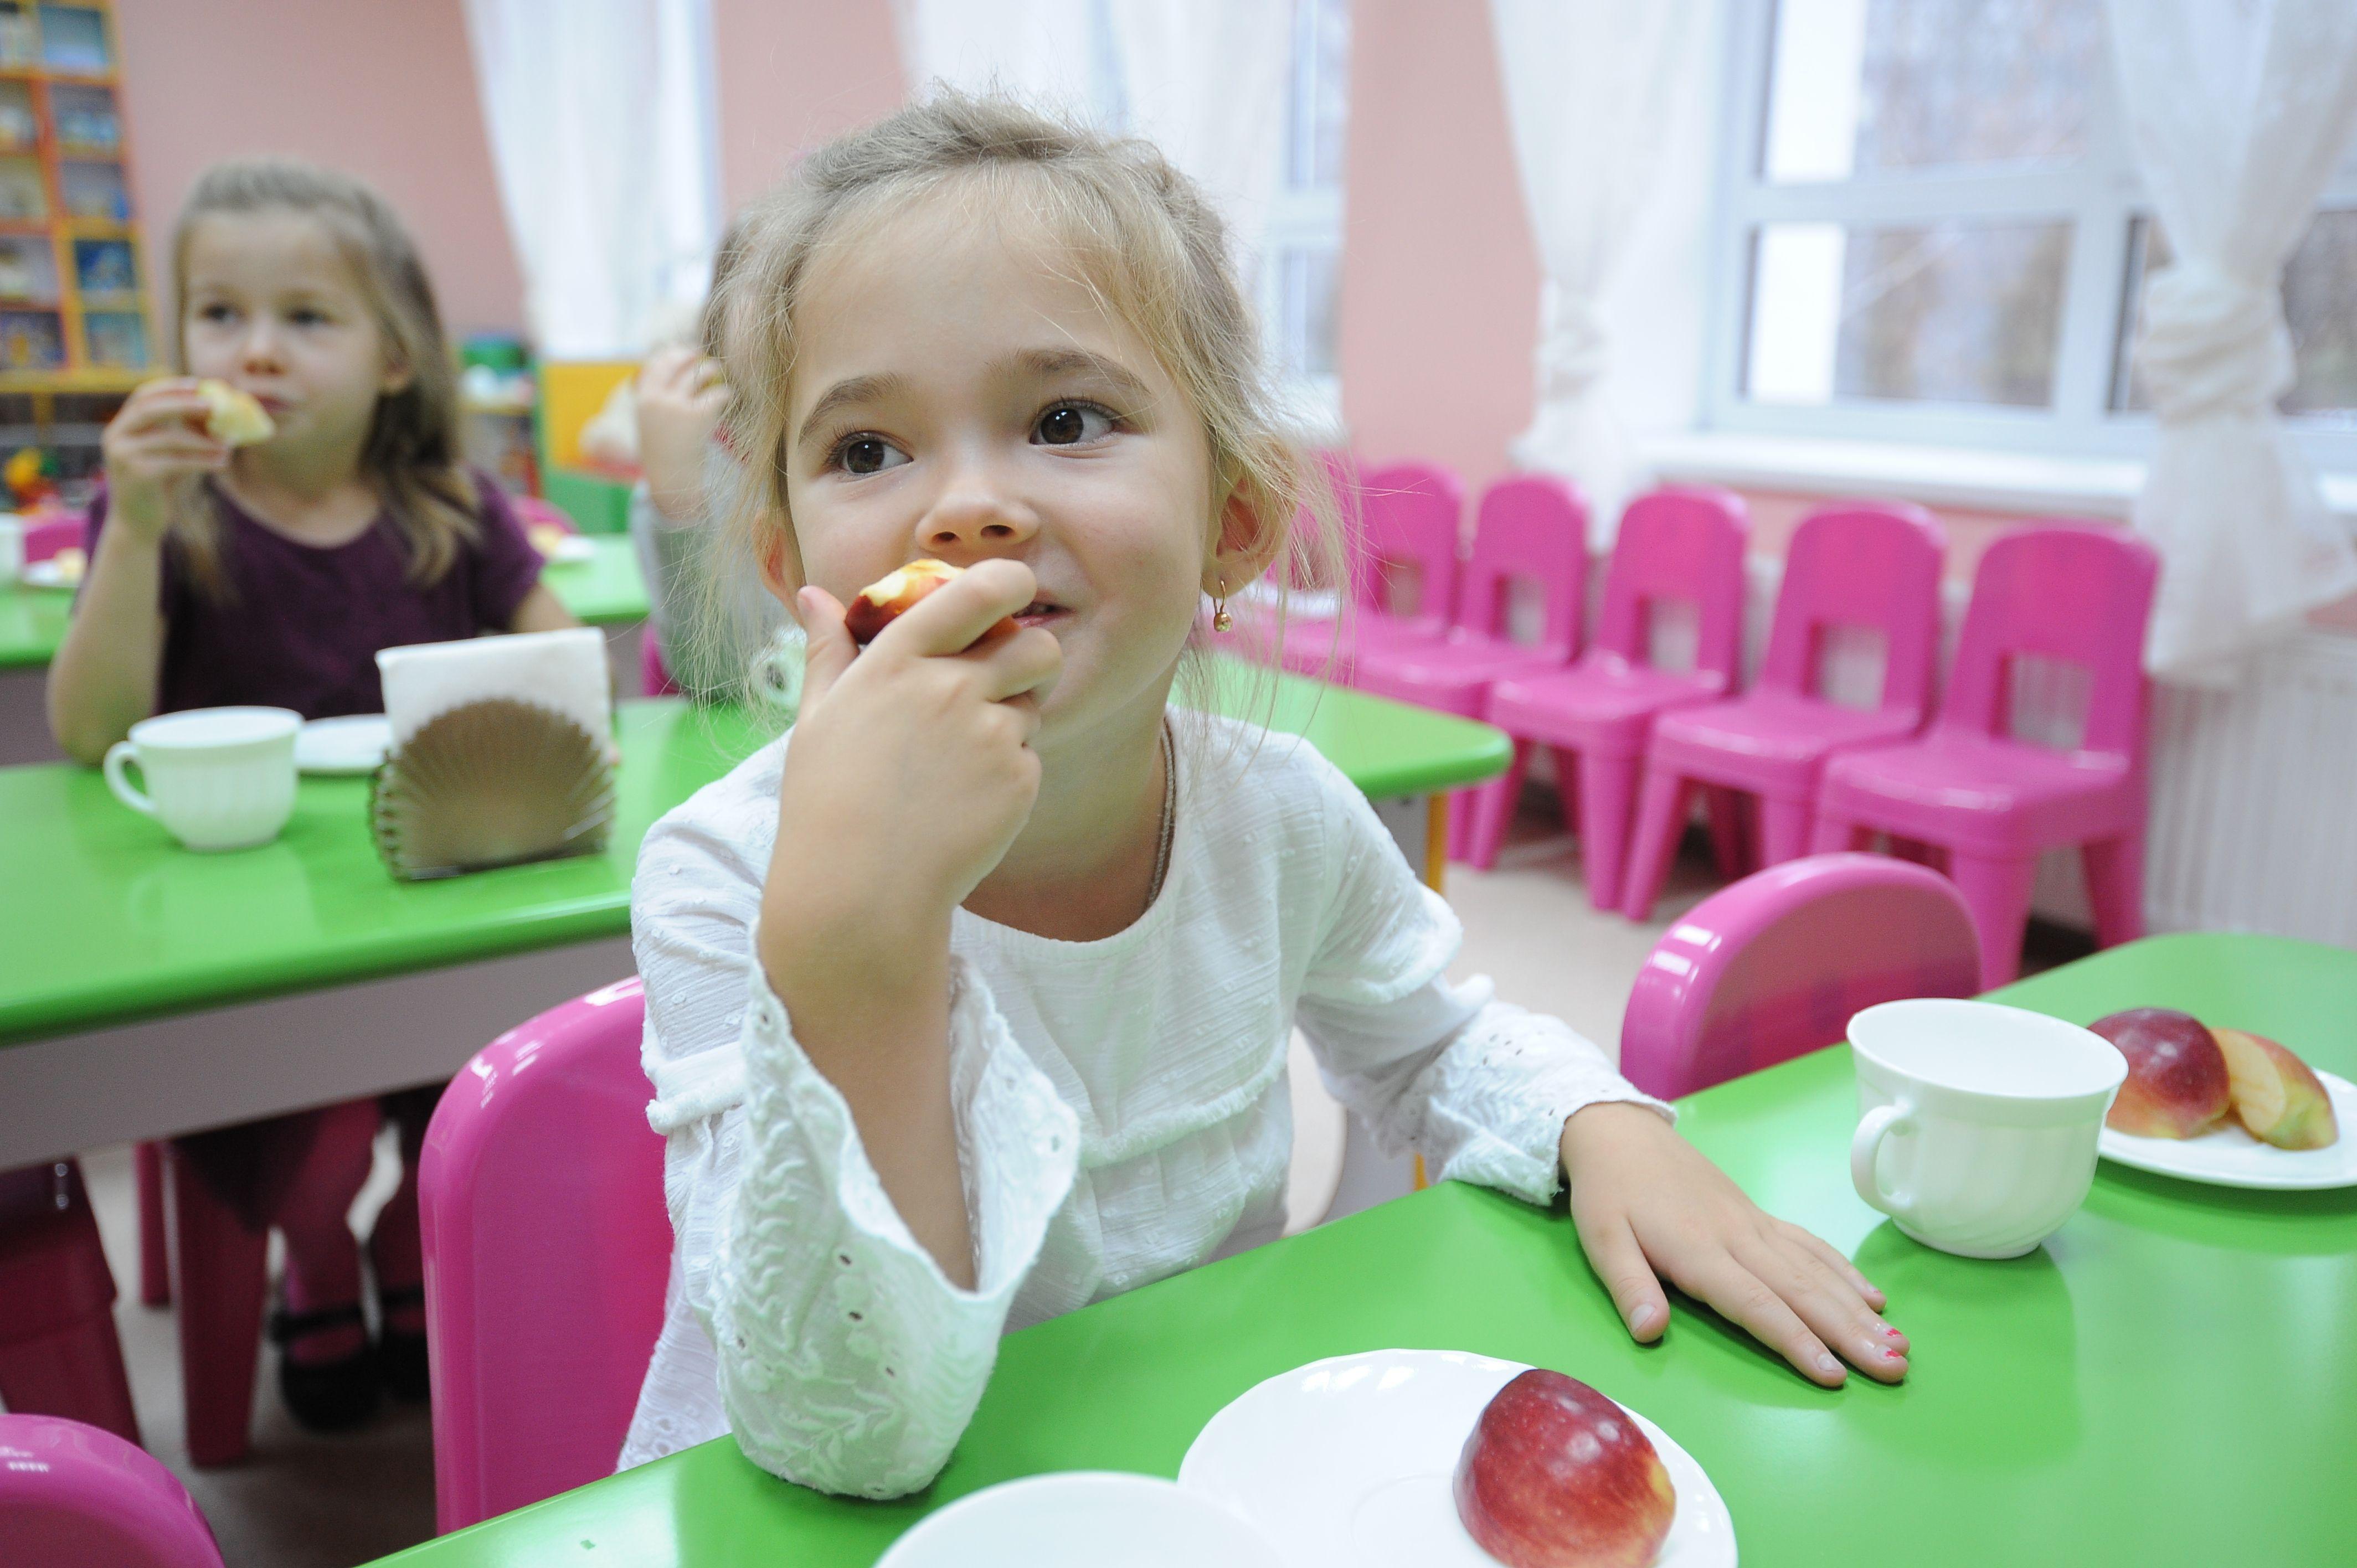 Детский сад на 250 мест построят на юге Москвы